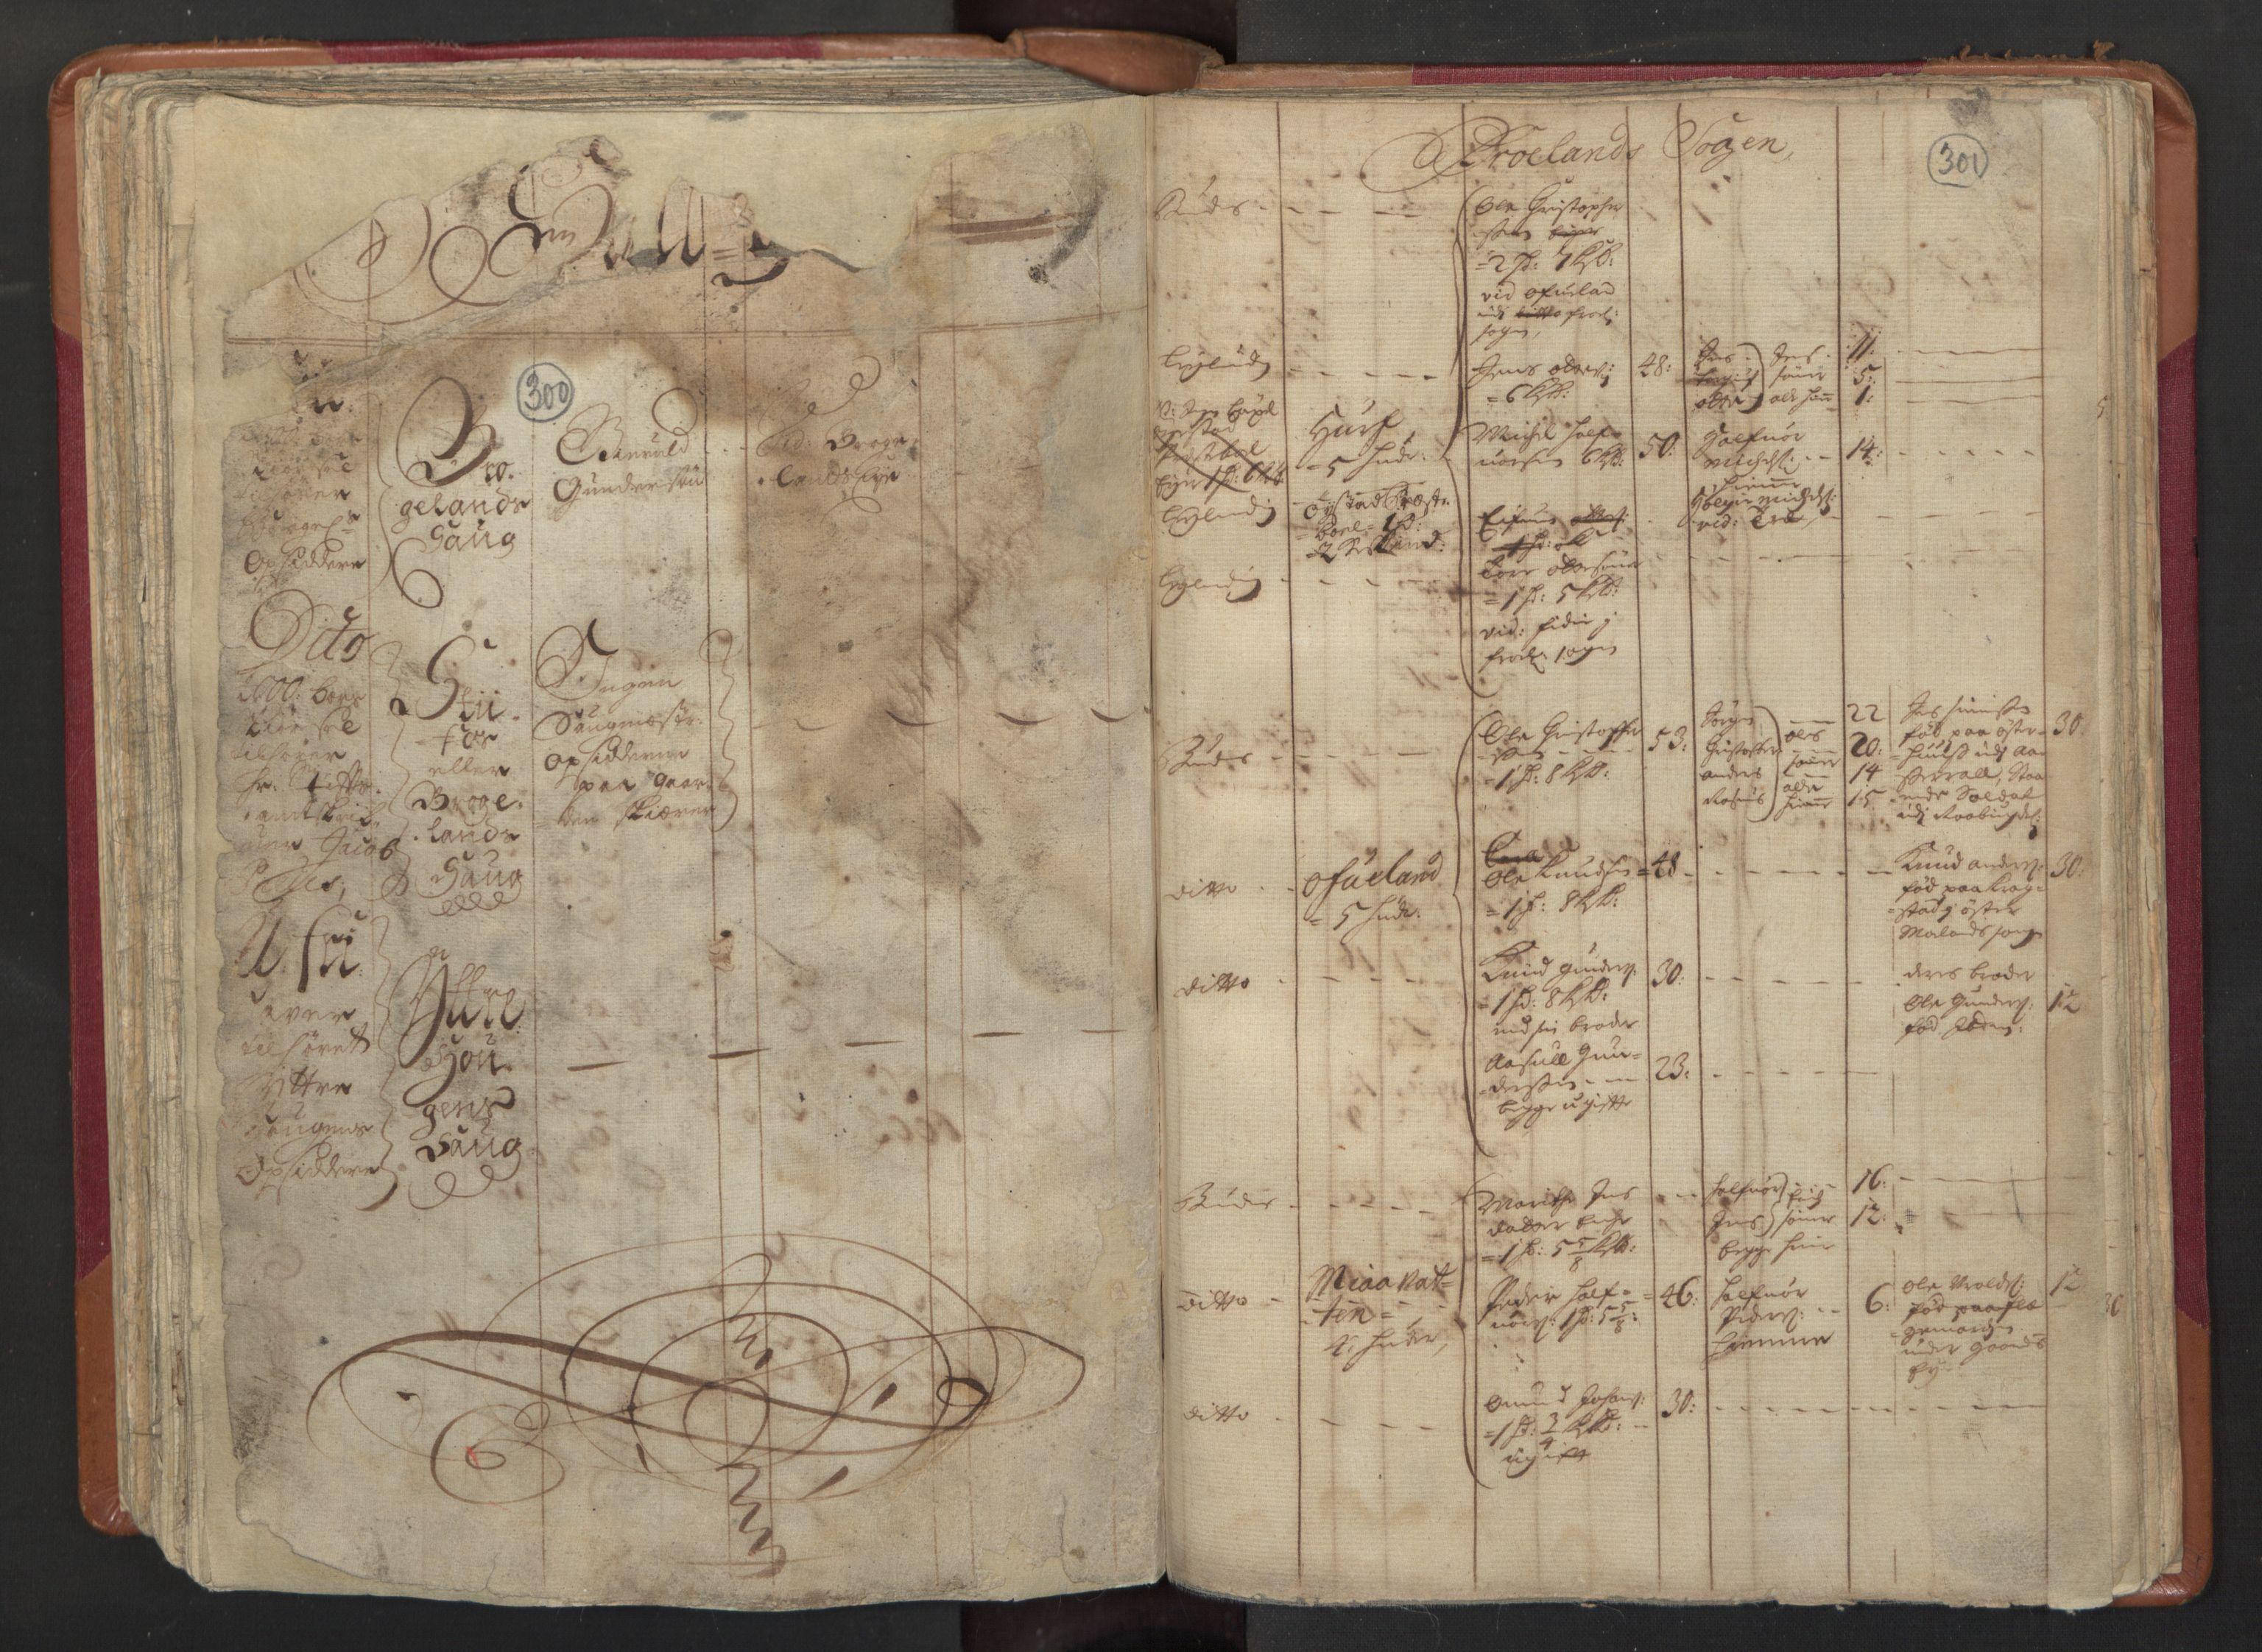 RA, Manntallet 1701, nr. 3: Nedenes fogderi, 1701, s. 300-301